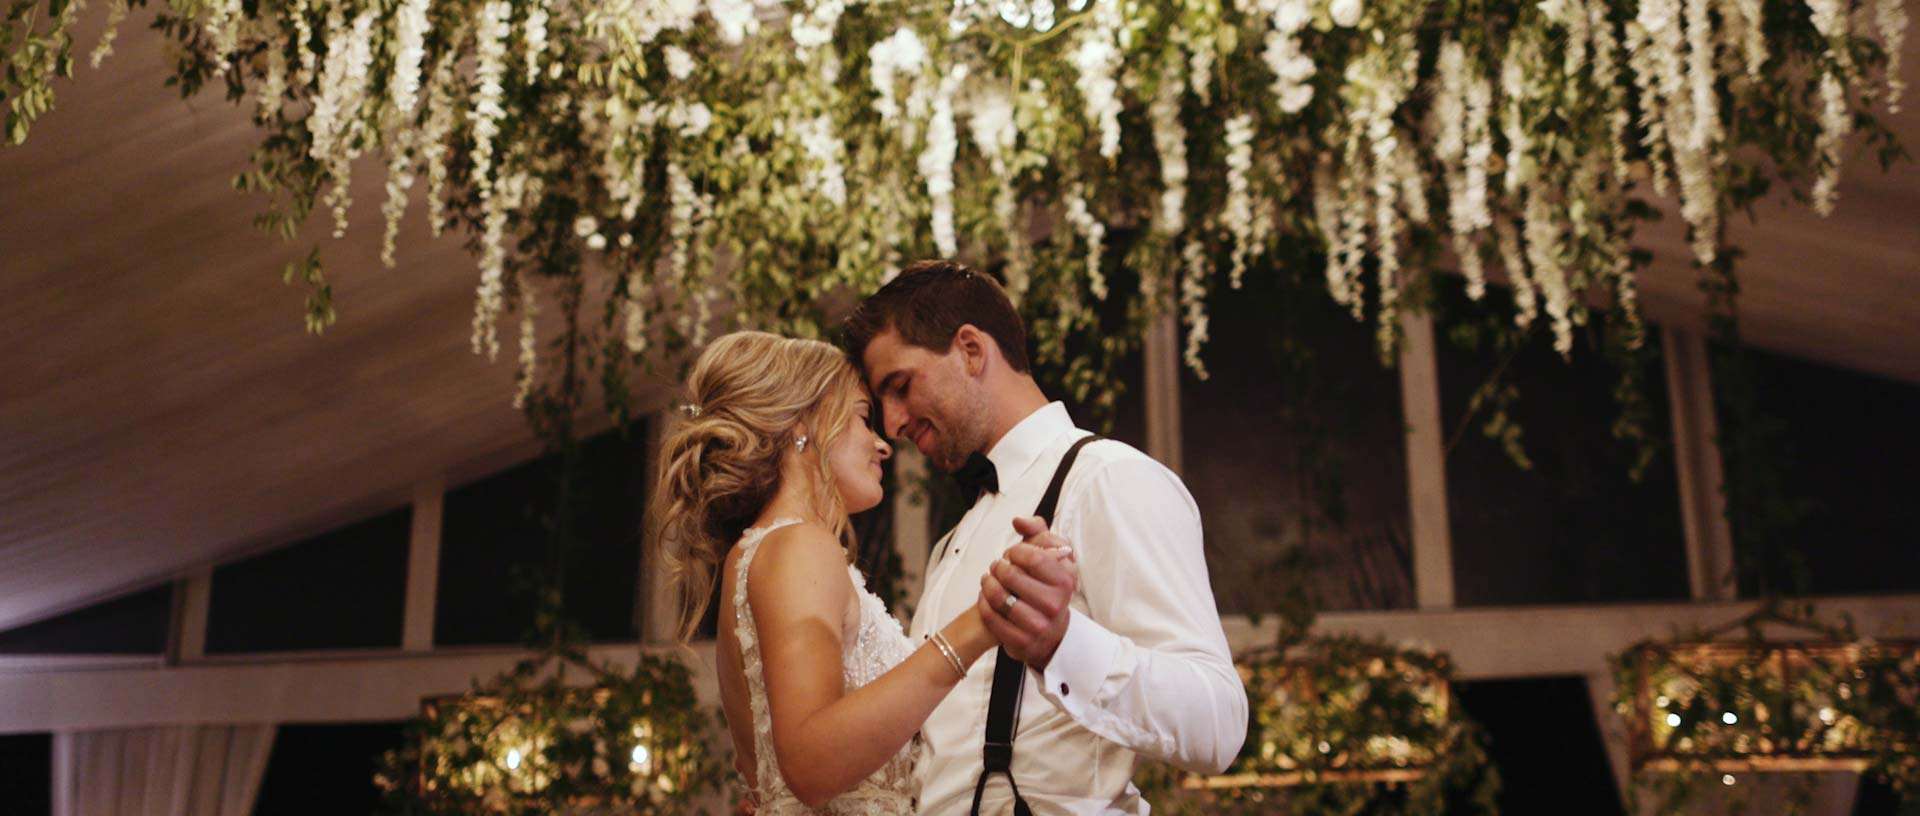 The Wedding Of Aryne And John Tavares In Niagara On The